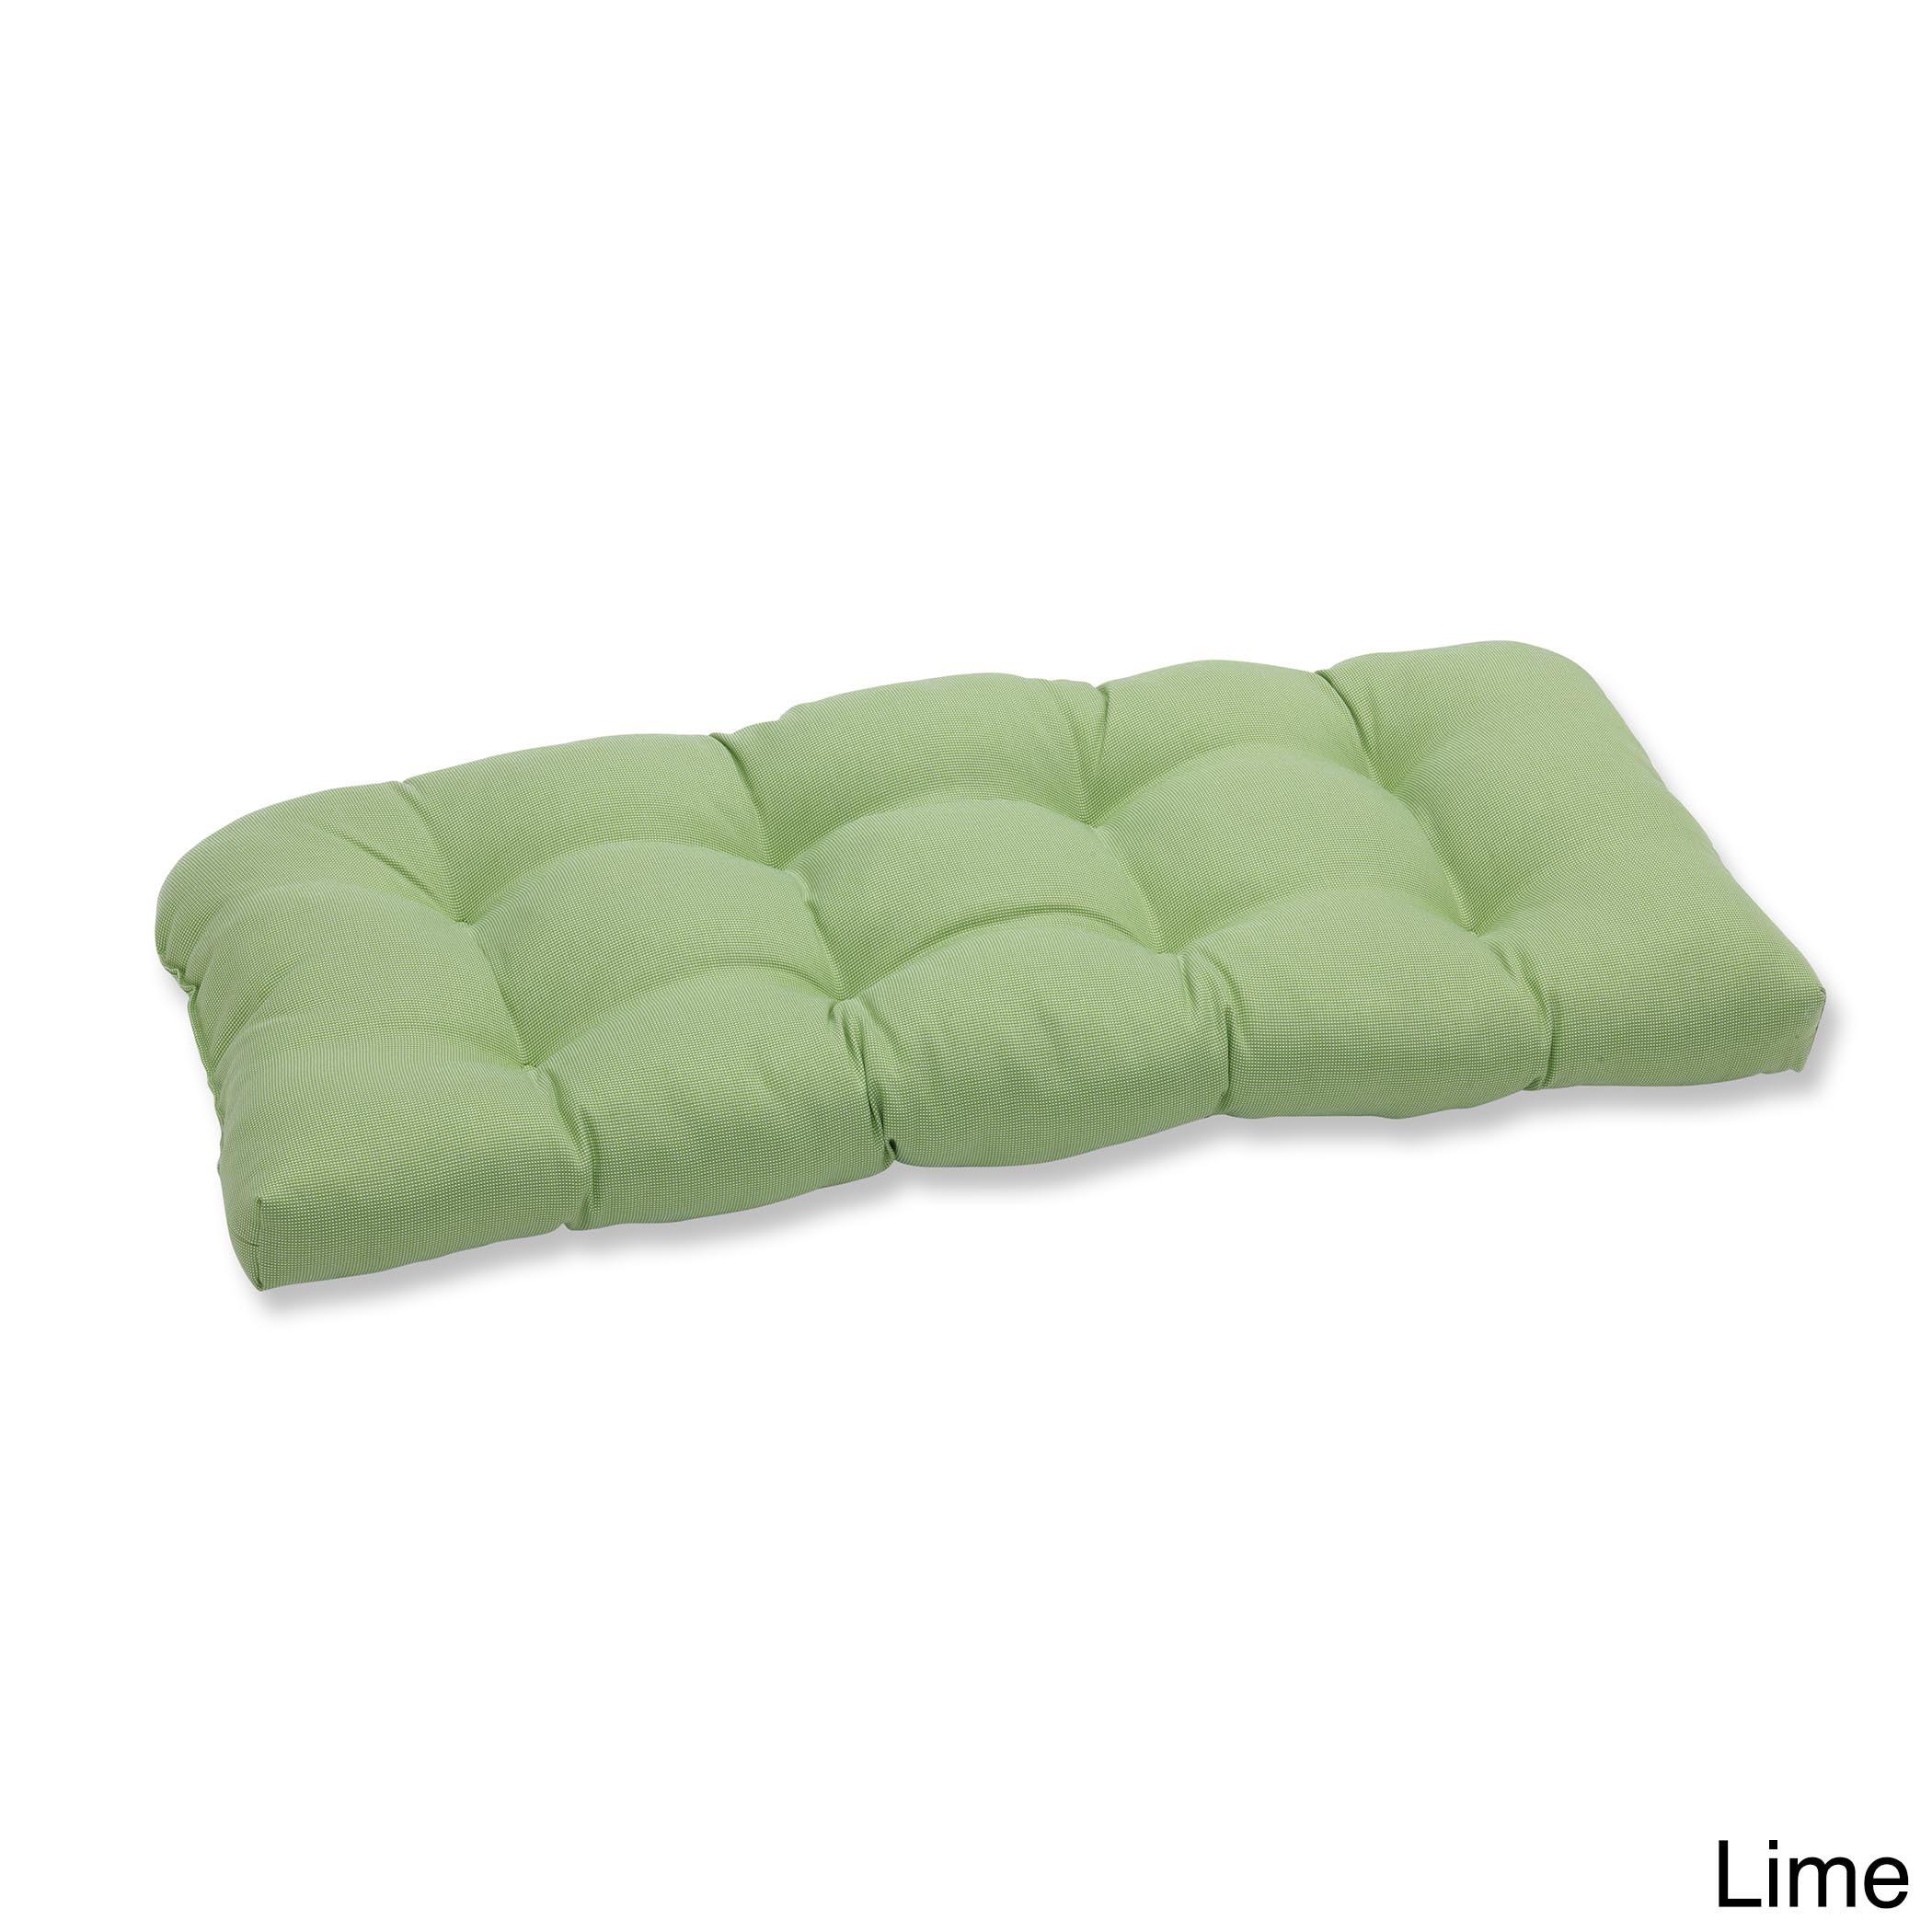 pillow itm ebay loveseat new geo cushion perfect outdoor